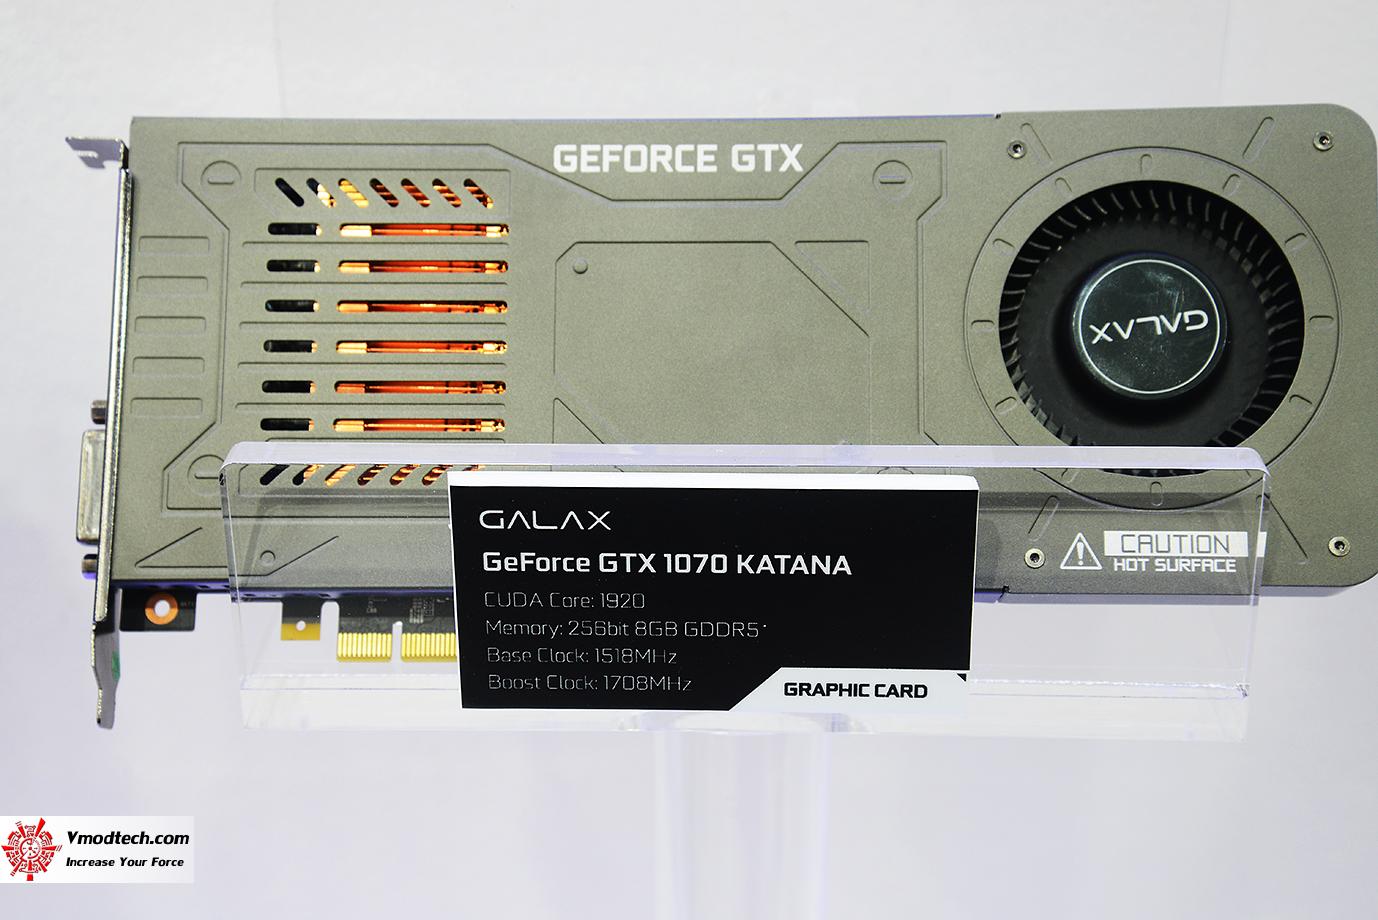 dsc 3346 Visit GALAX Booth @ Computex 2018